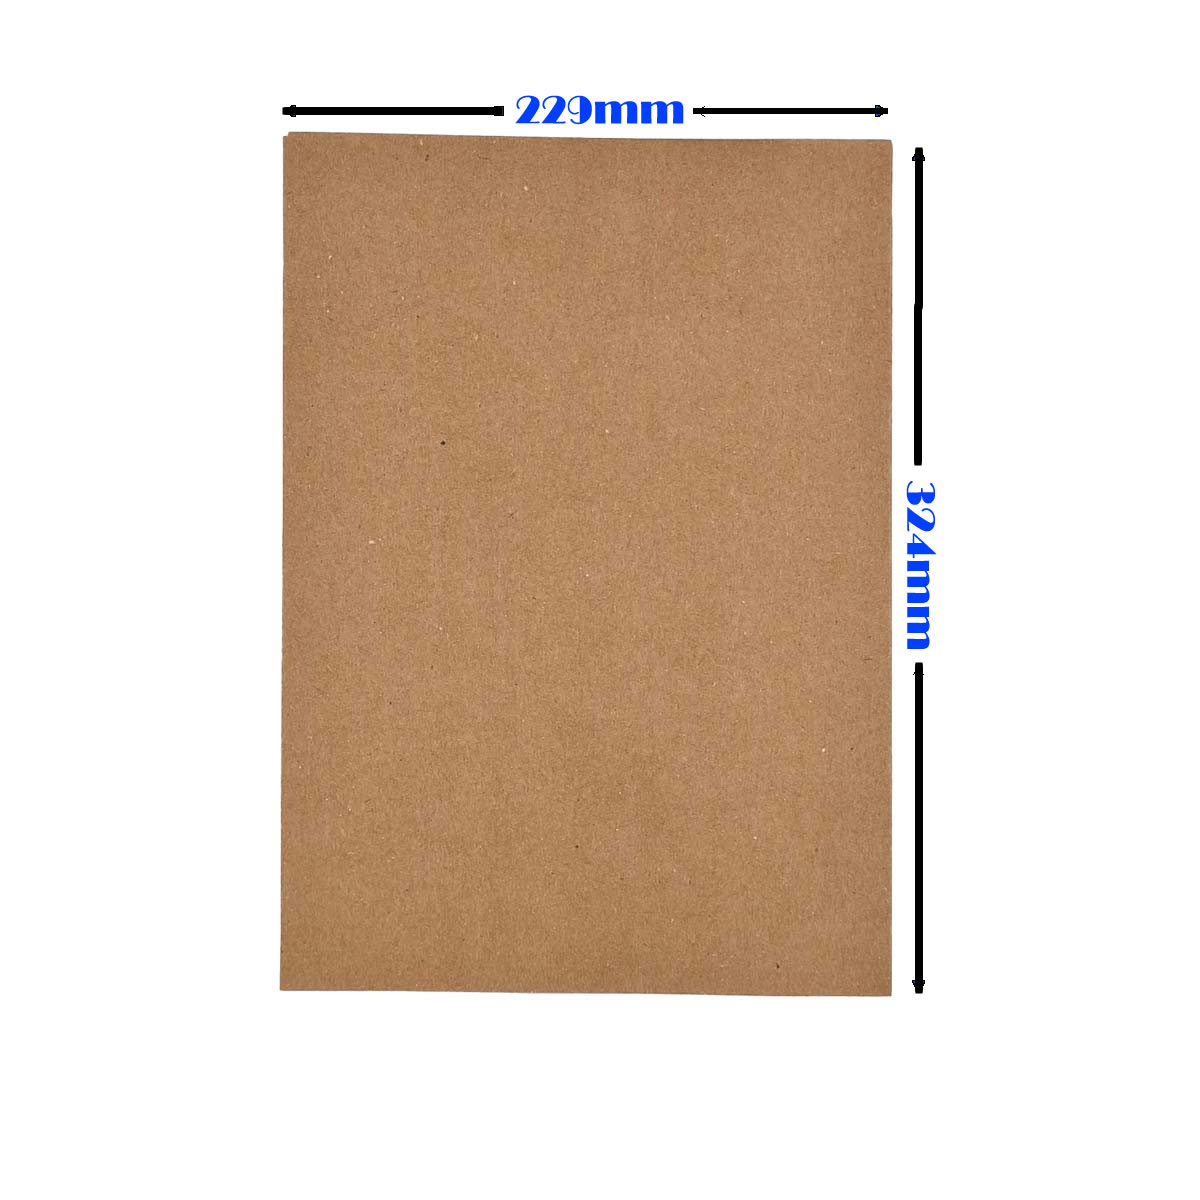 Envelope Saco kraft Natural 80g 229x324 Foroni com 100un Cabe A4